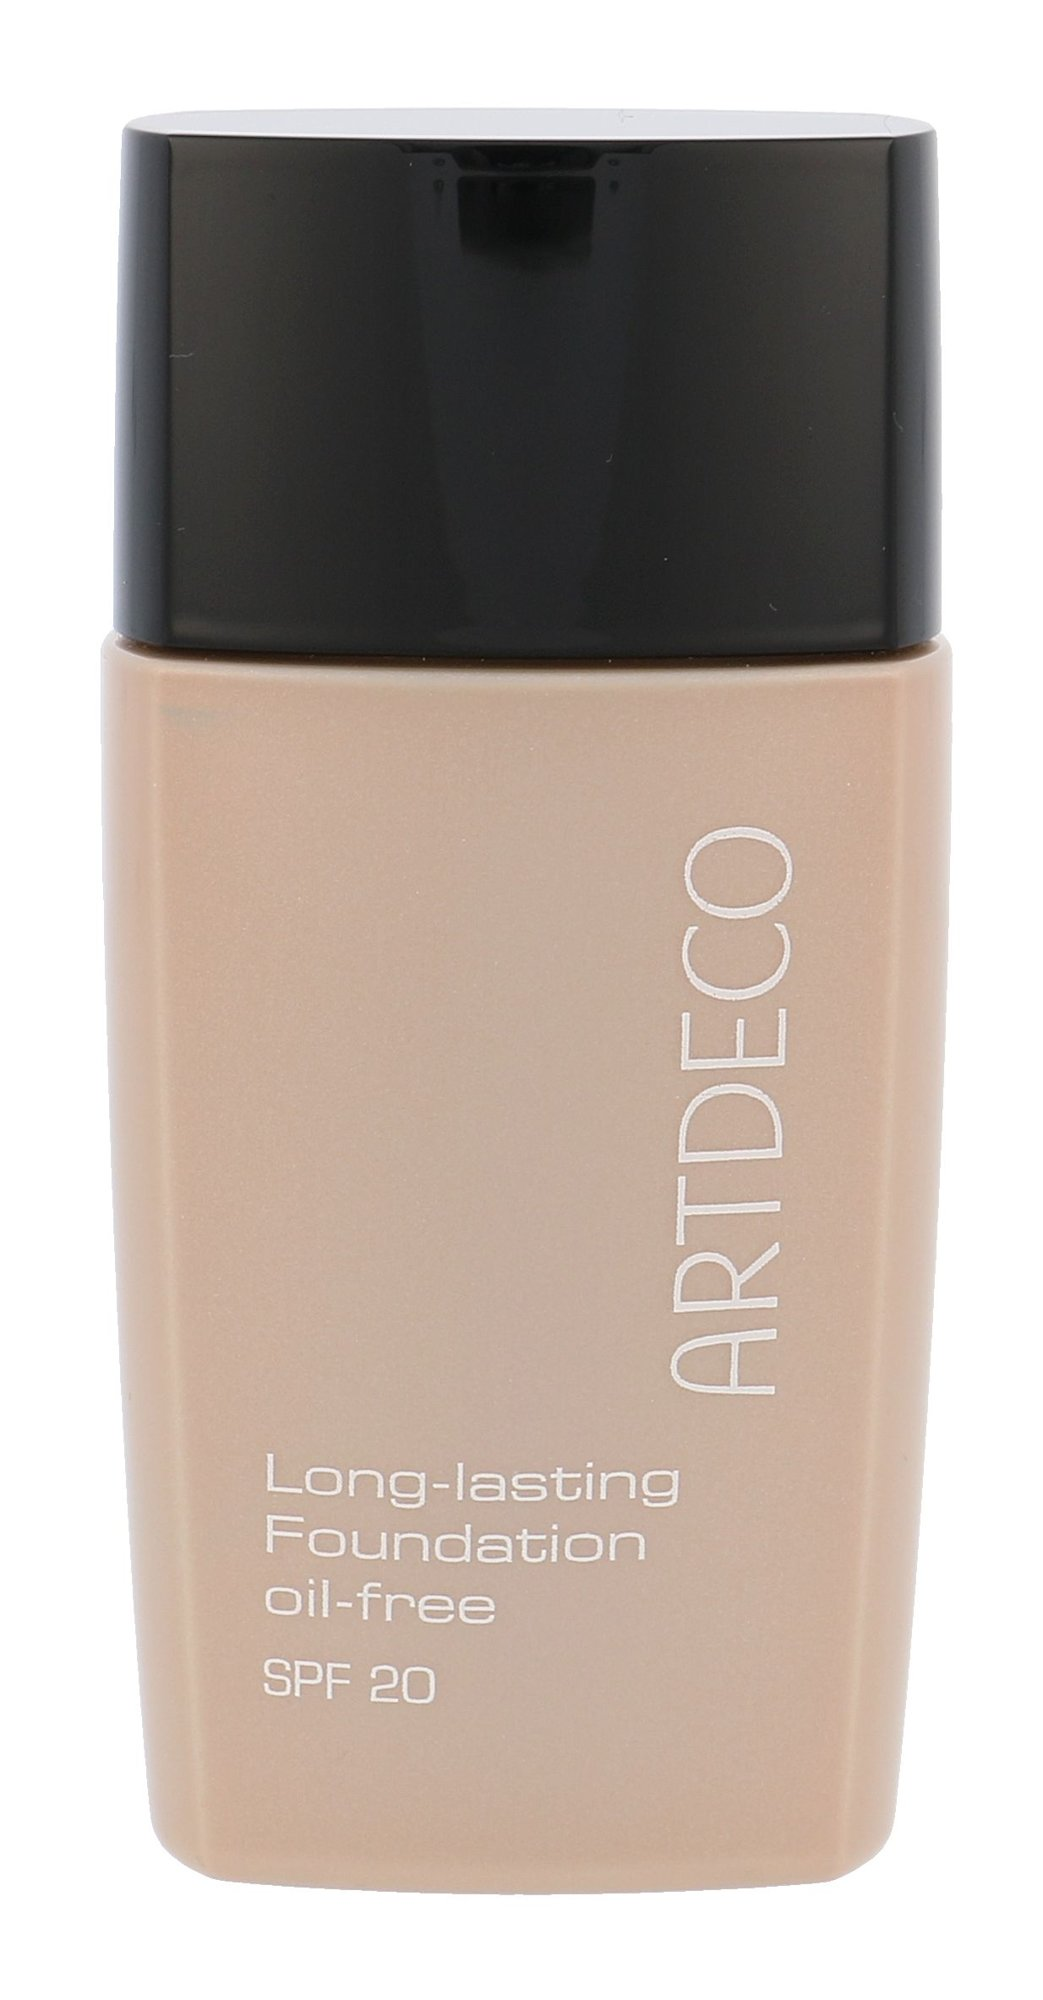 Artdeco Long Lasting Foundation Oil-Free Cosmetic 30ml 10 Rosy Tan